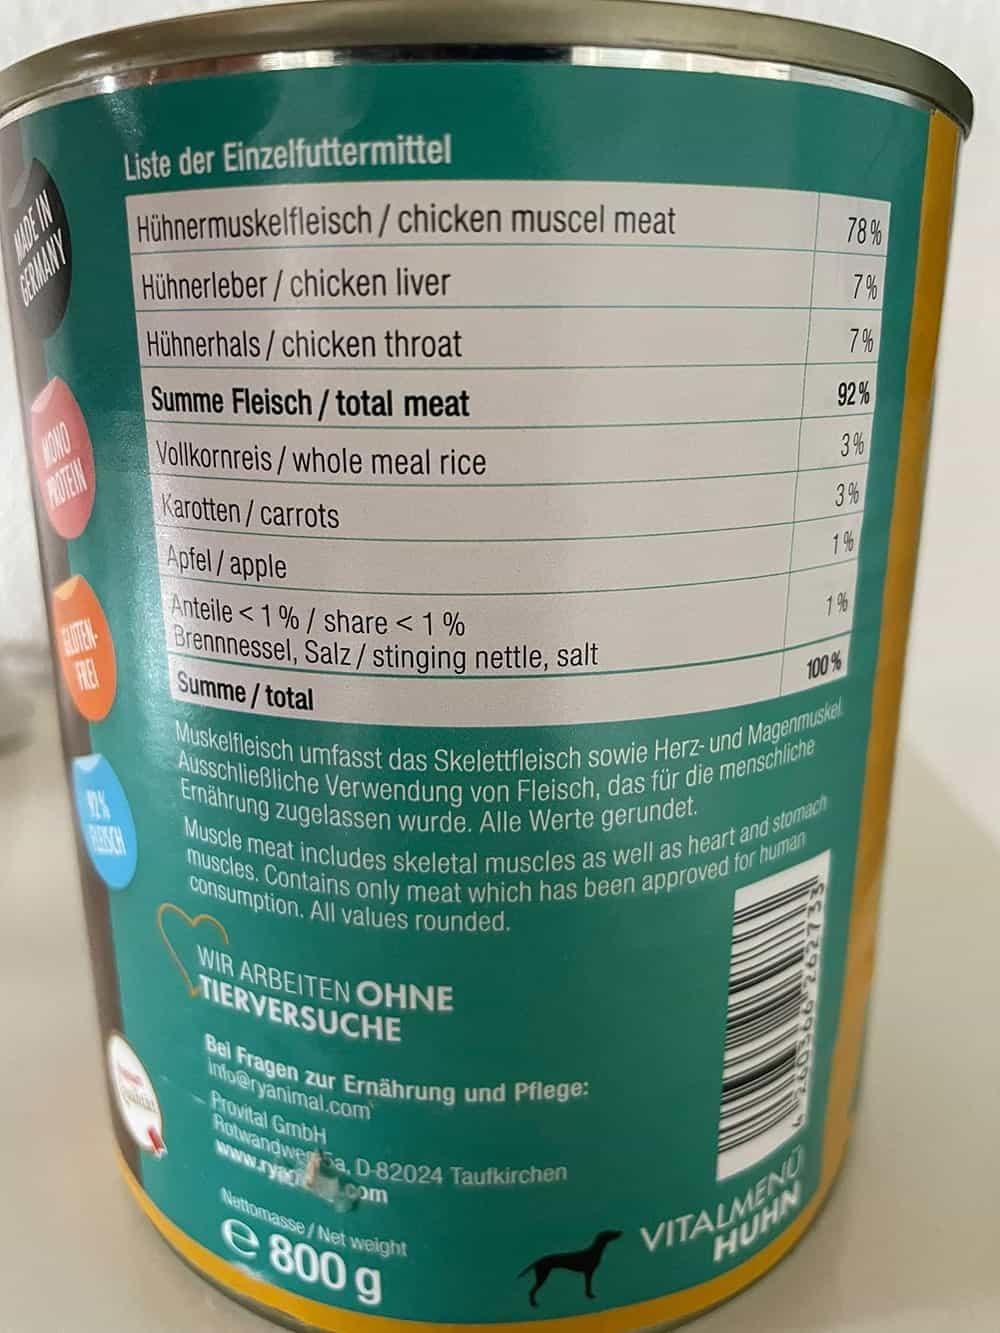 Rydog Vitalmenü Huhn Liste der Einzelfuttermittel